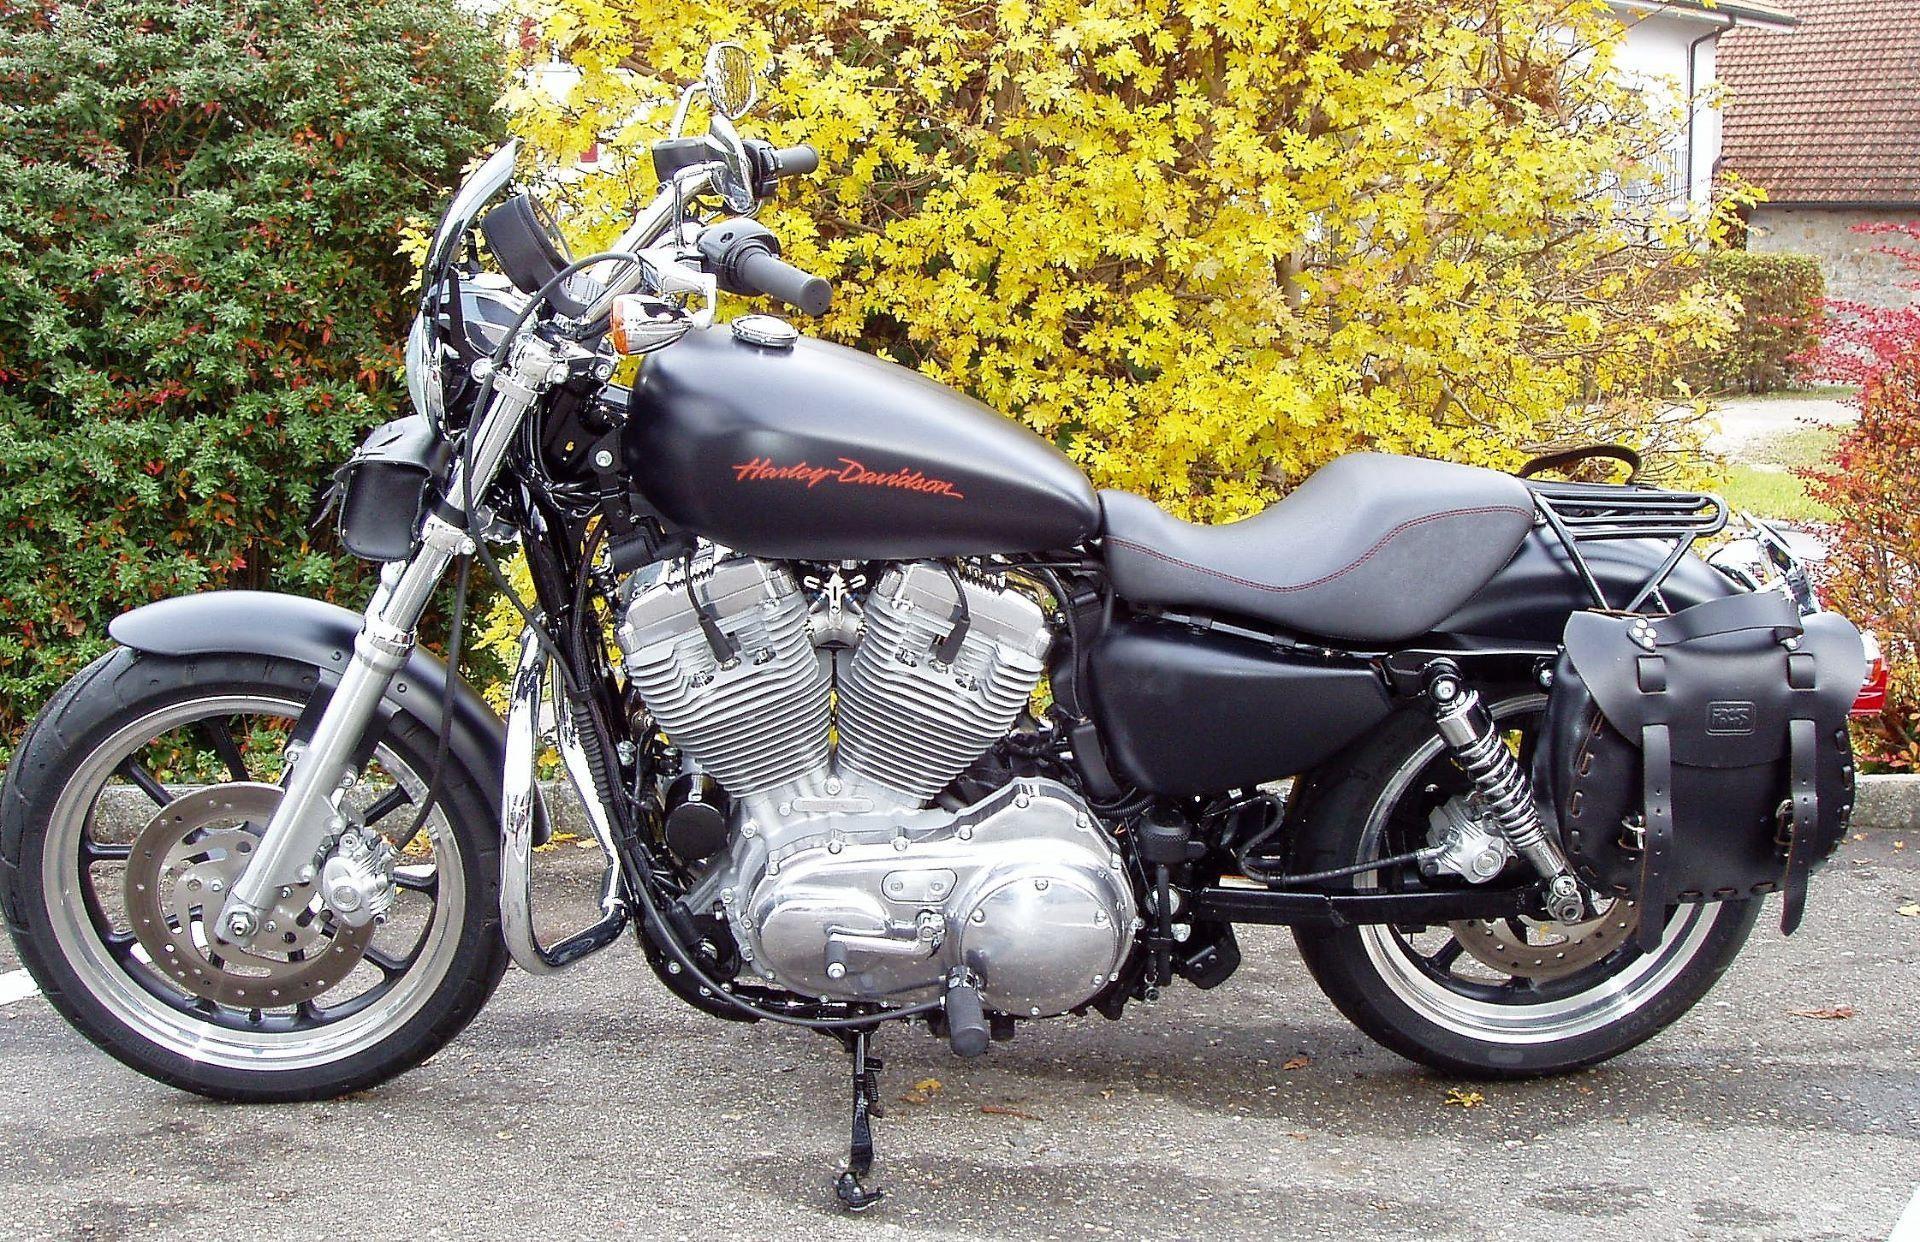 motorrad occasion kaufen harley davidson xl 883l sportster low bapst motos ag selzach. Black Bedroom Furniture Sets. Home Design Ideas